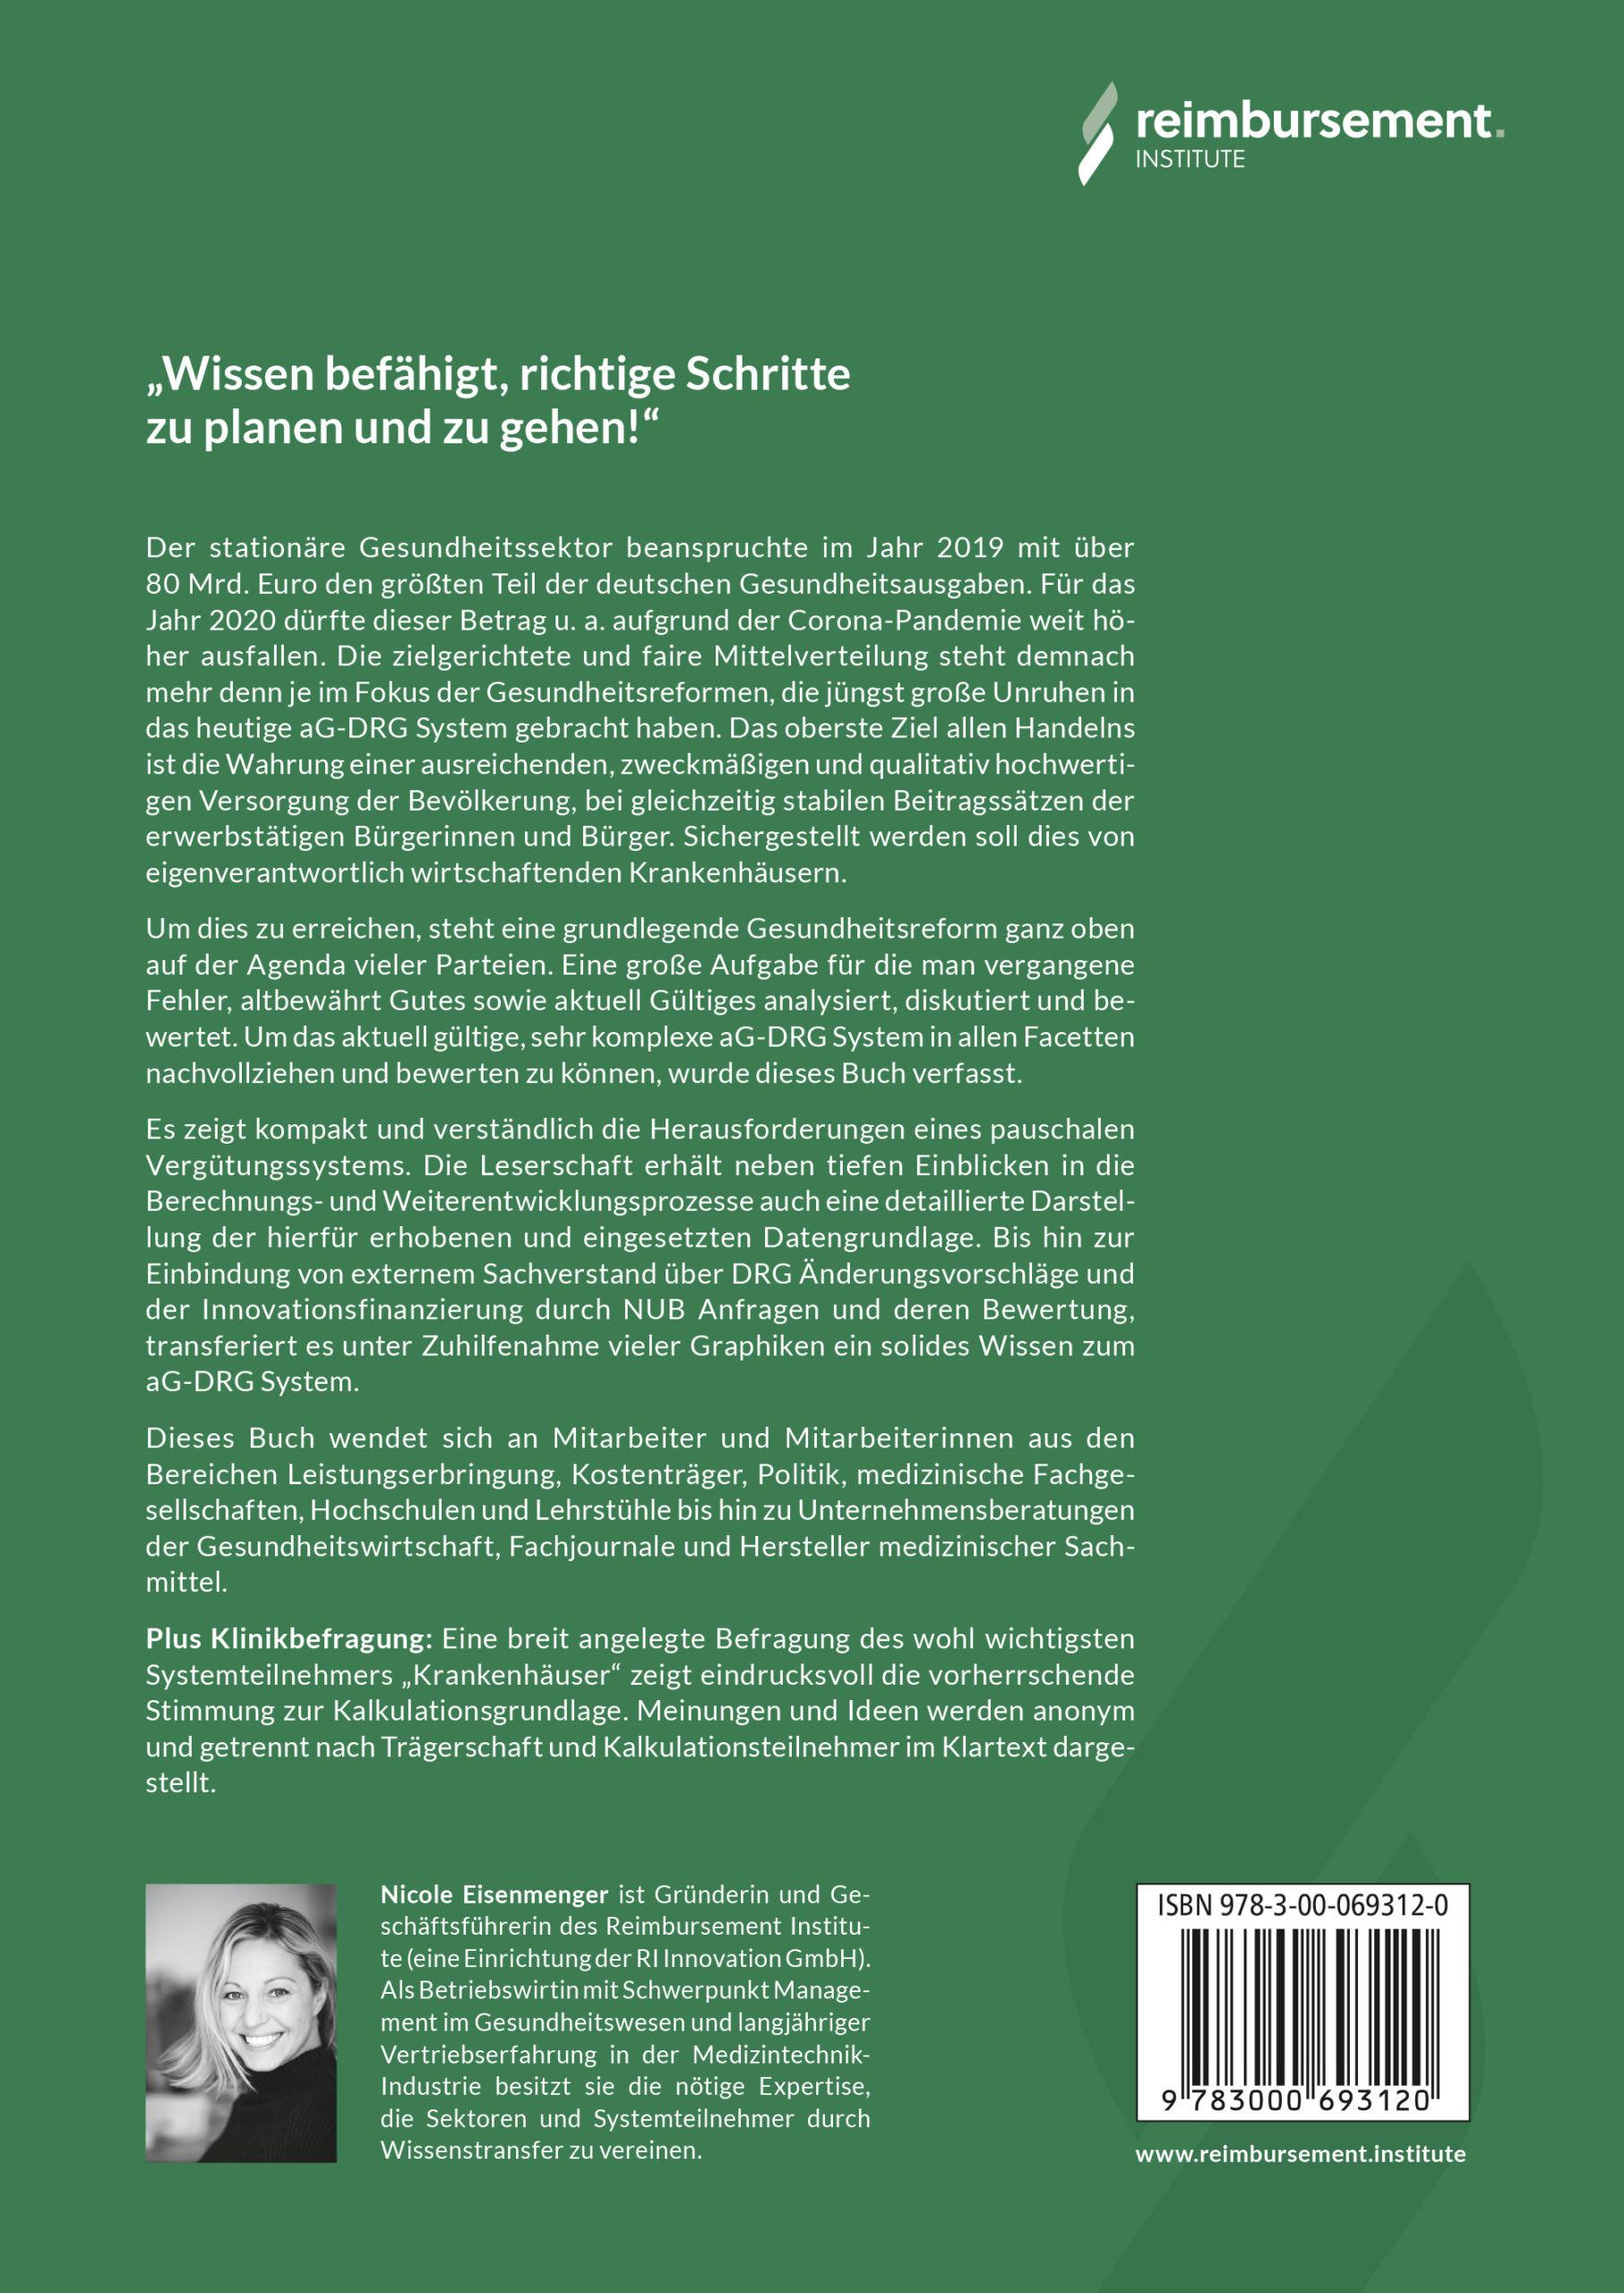 Nicole Eisenmenger - Buchautor - Das aG-DRG System